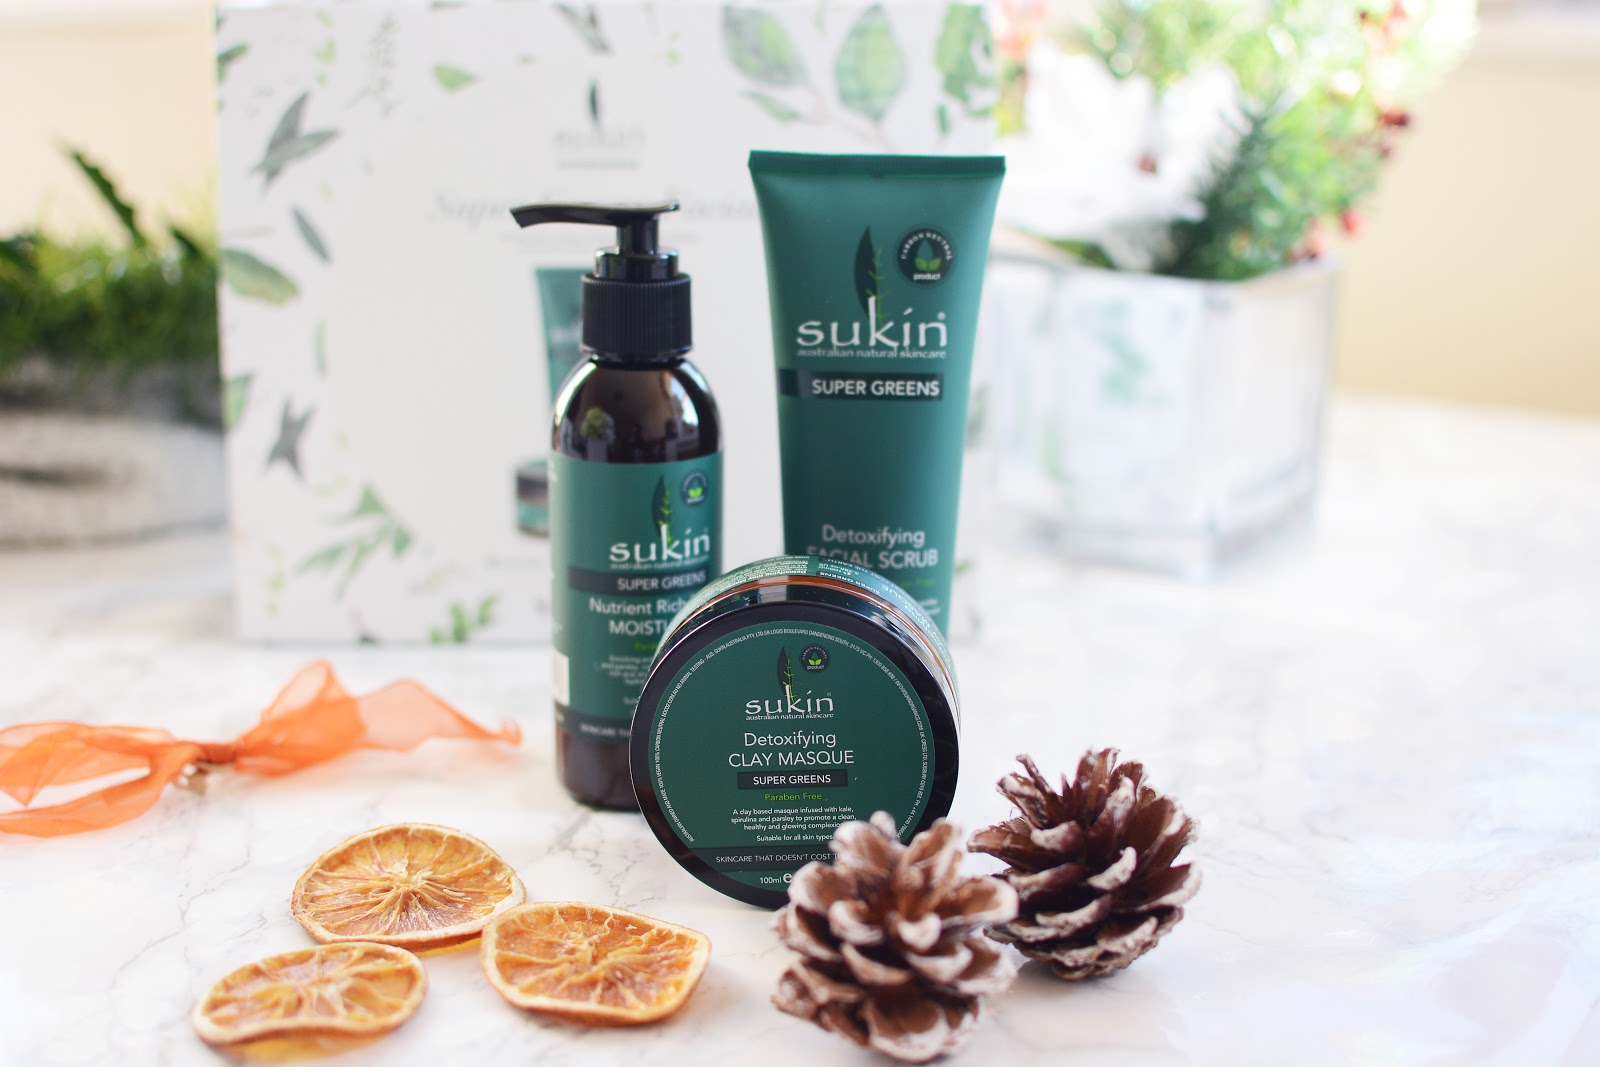 Sukin Super Greens Gift Set